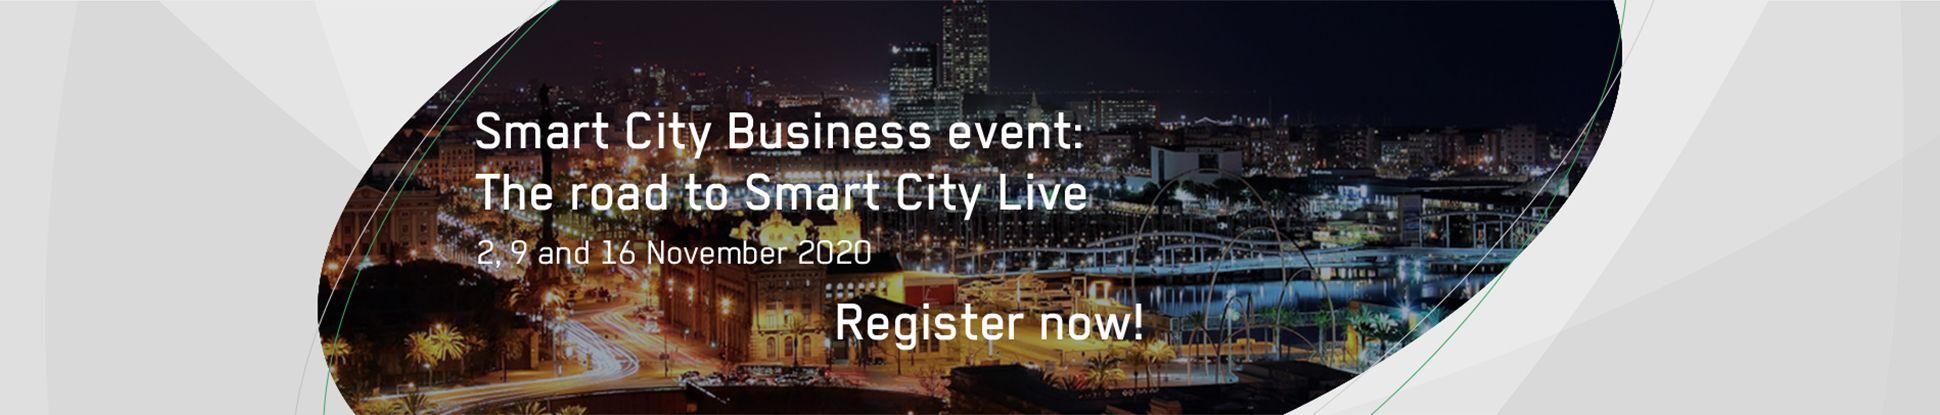 Jumbotron Smart City Event 2020.jpg